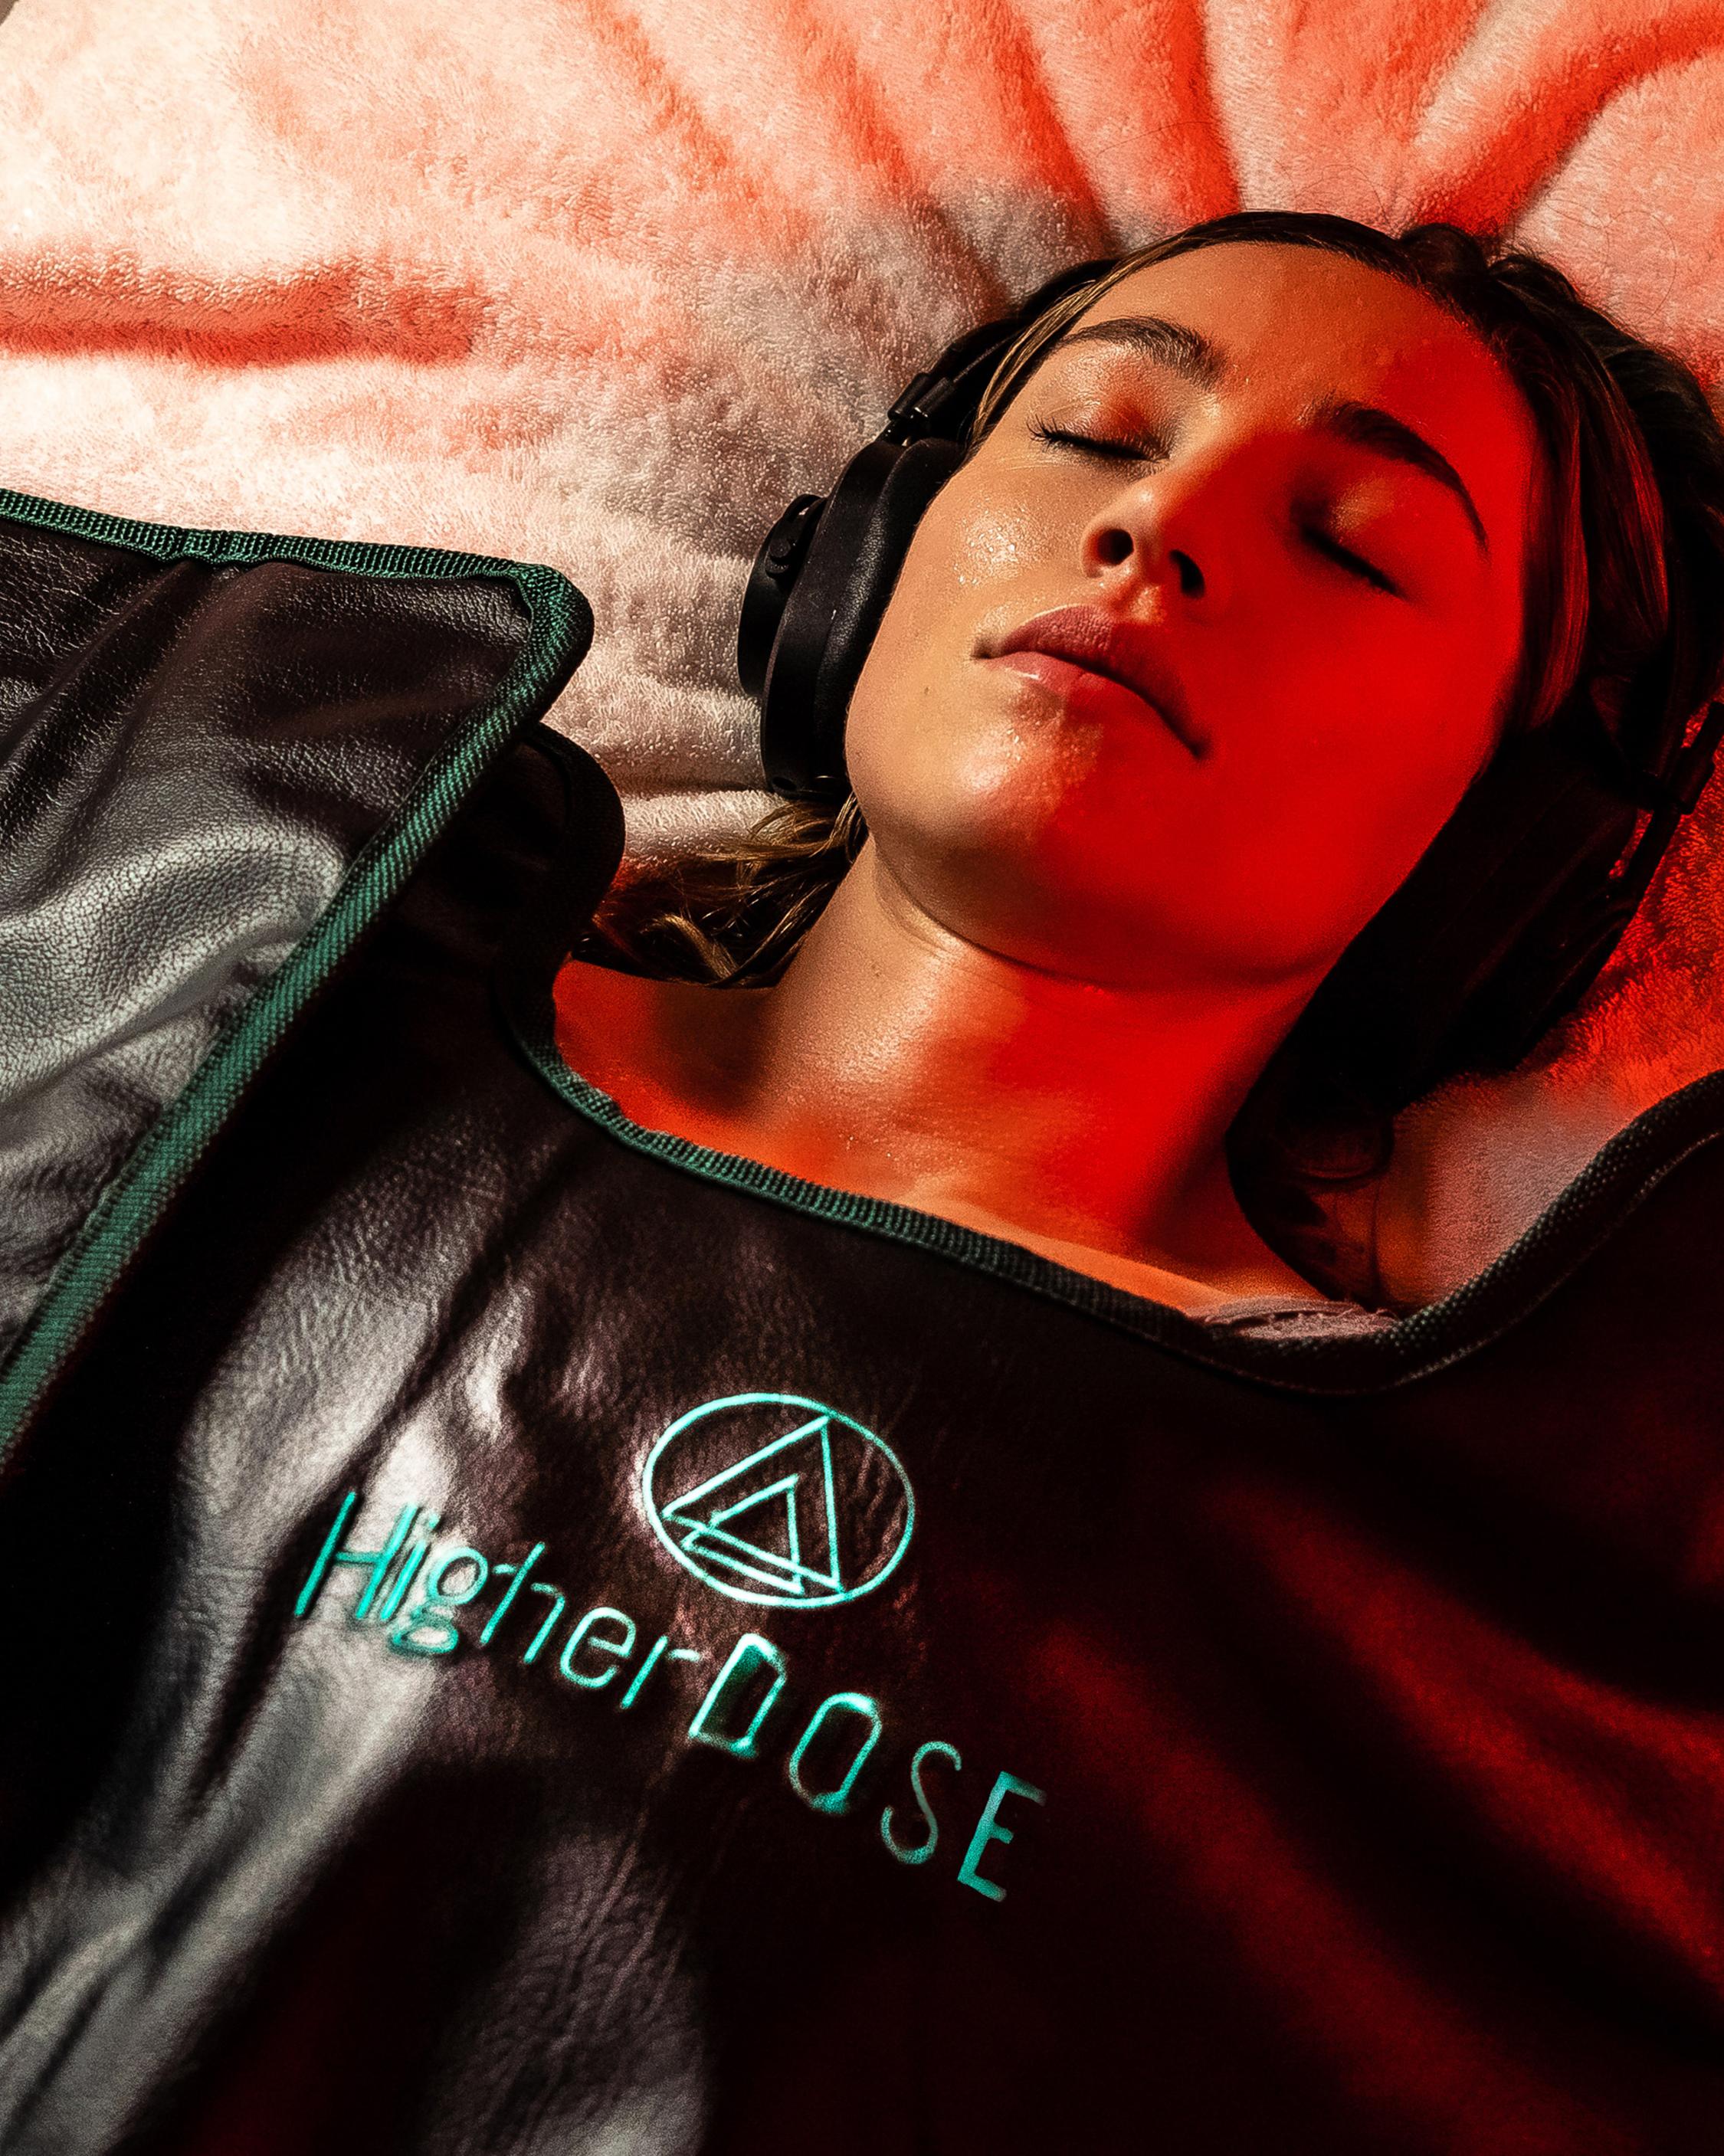 HigherDOSE Infrared Sauna Blanket 2